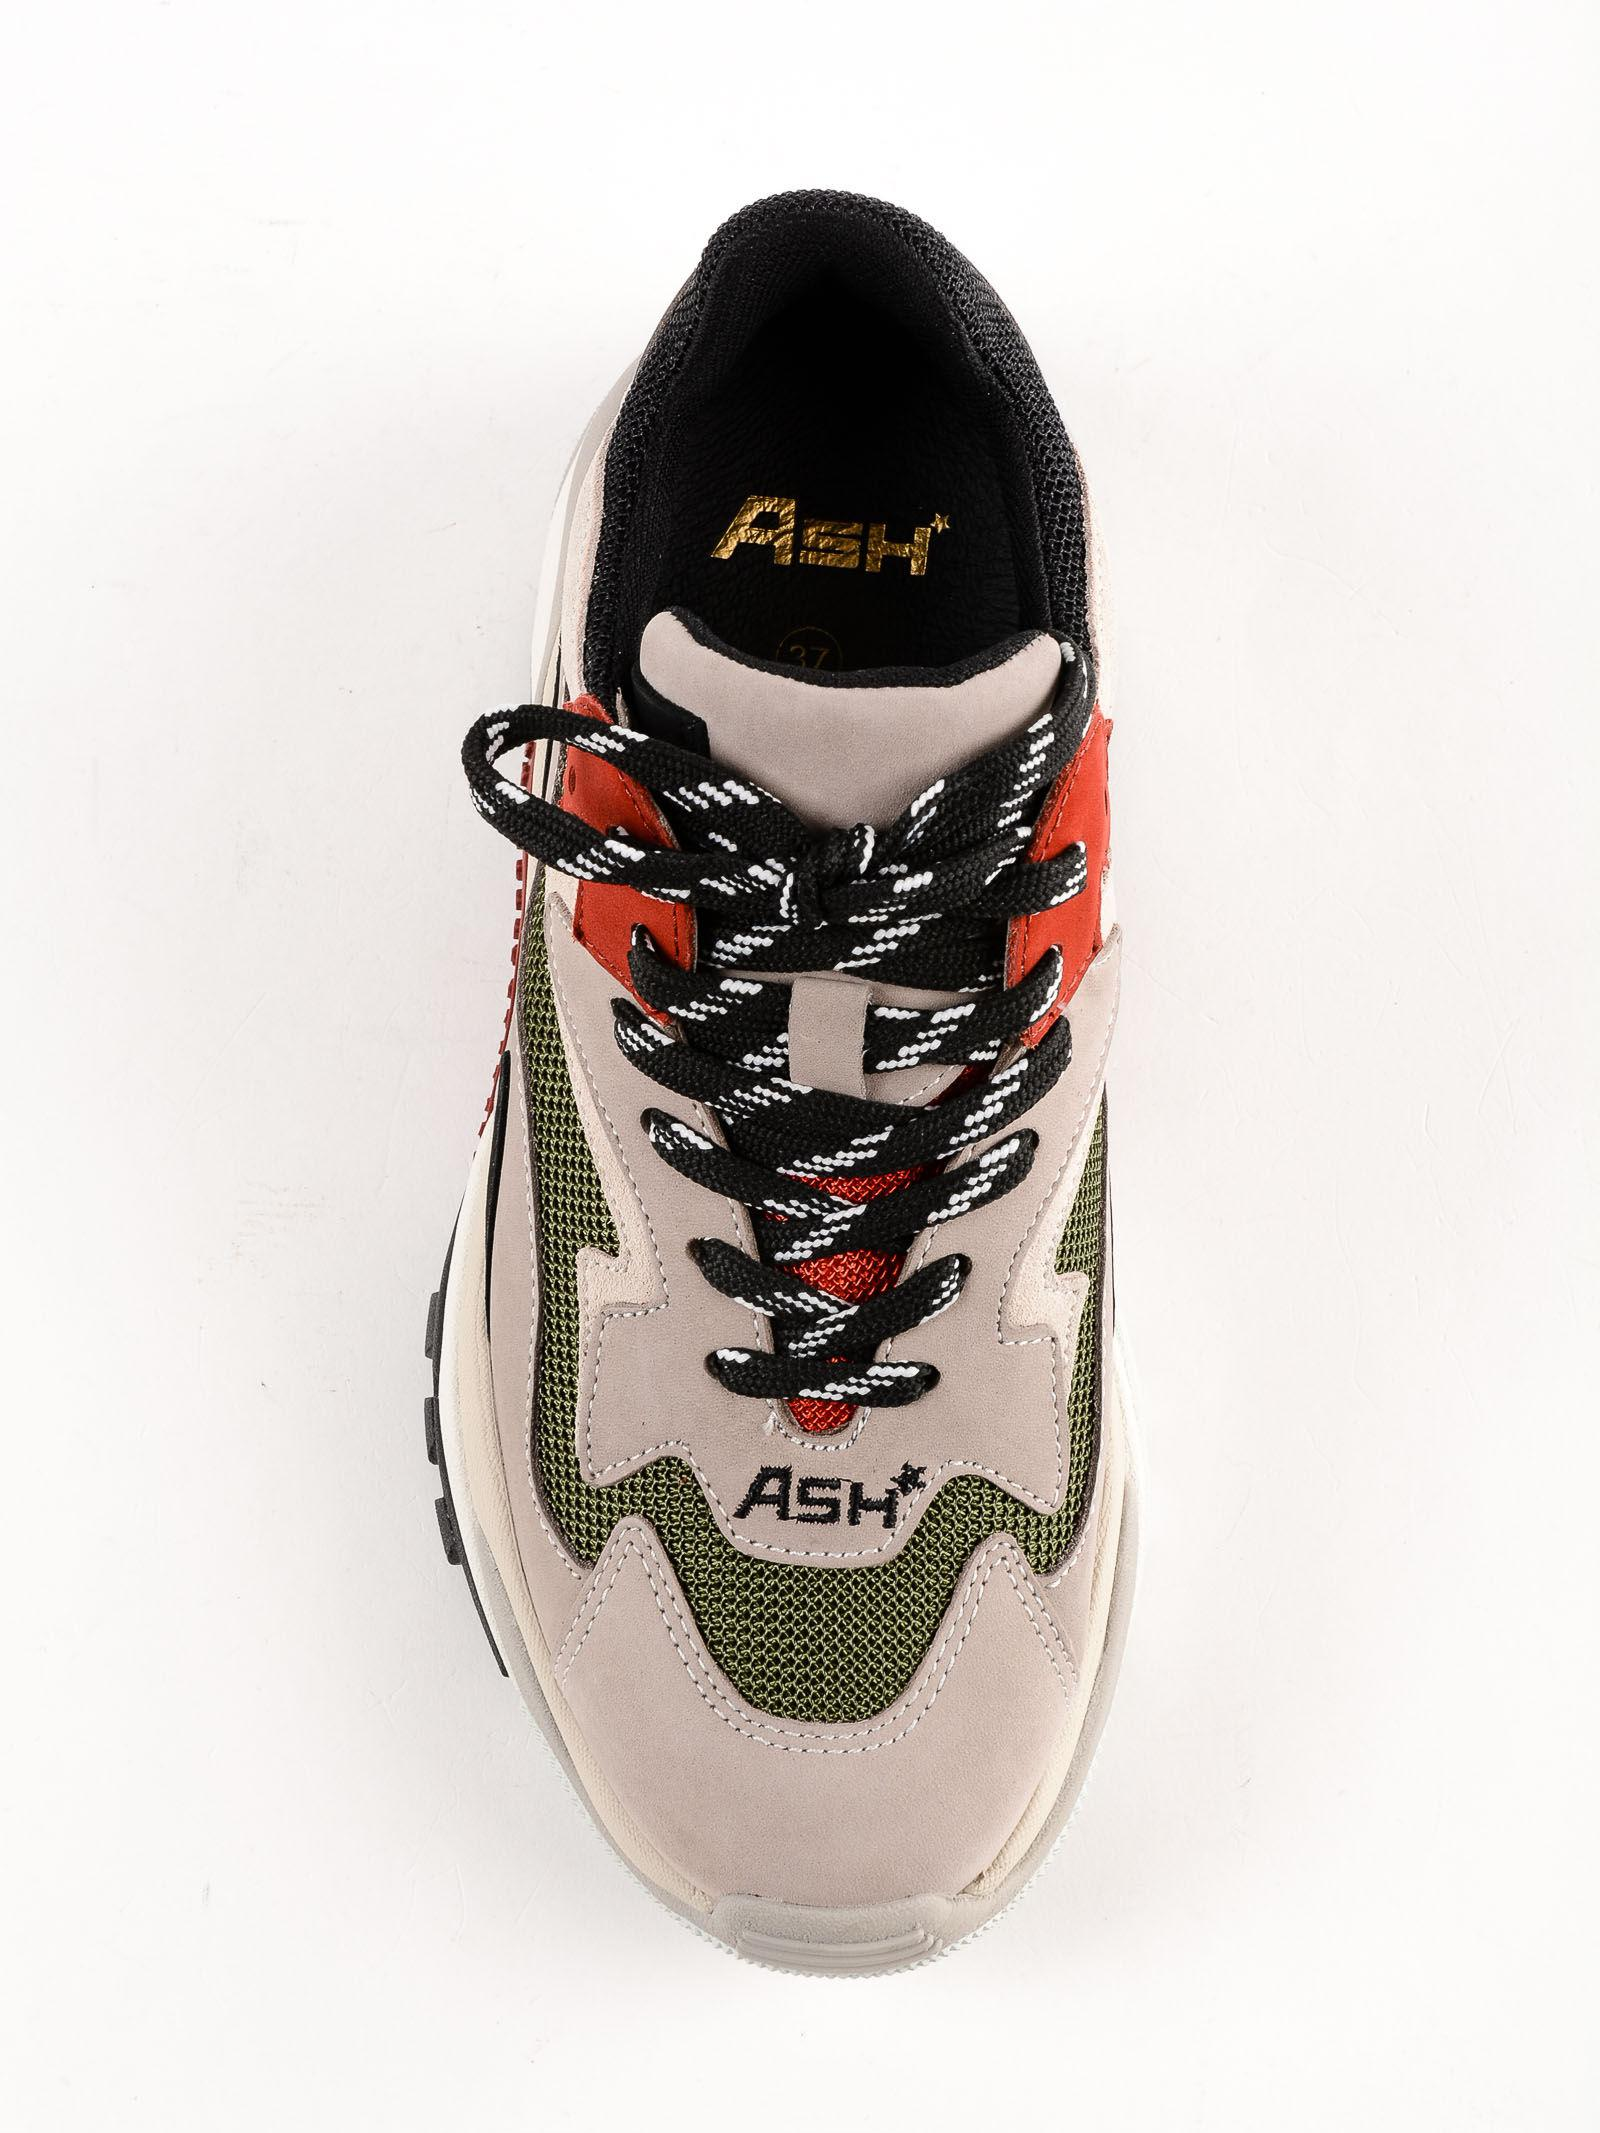 Ash Leather Sneakers Nappa Calf in Grey